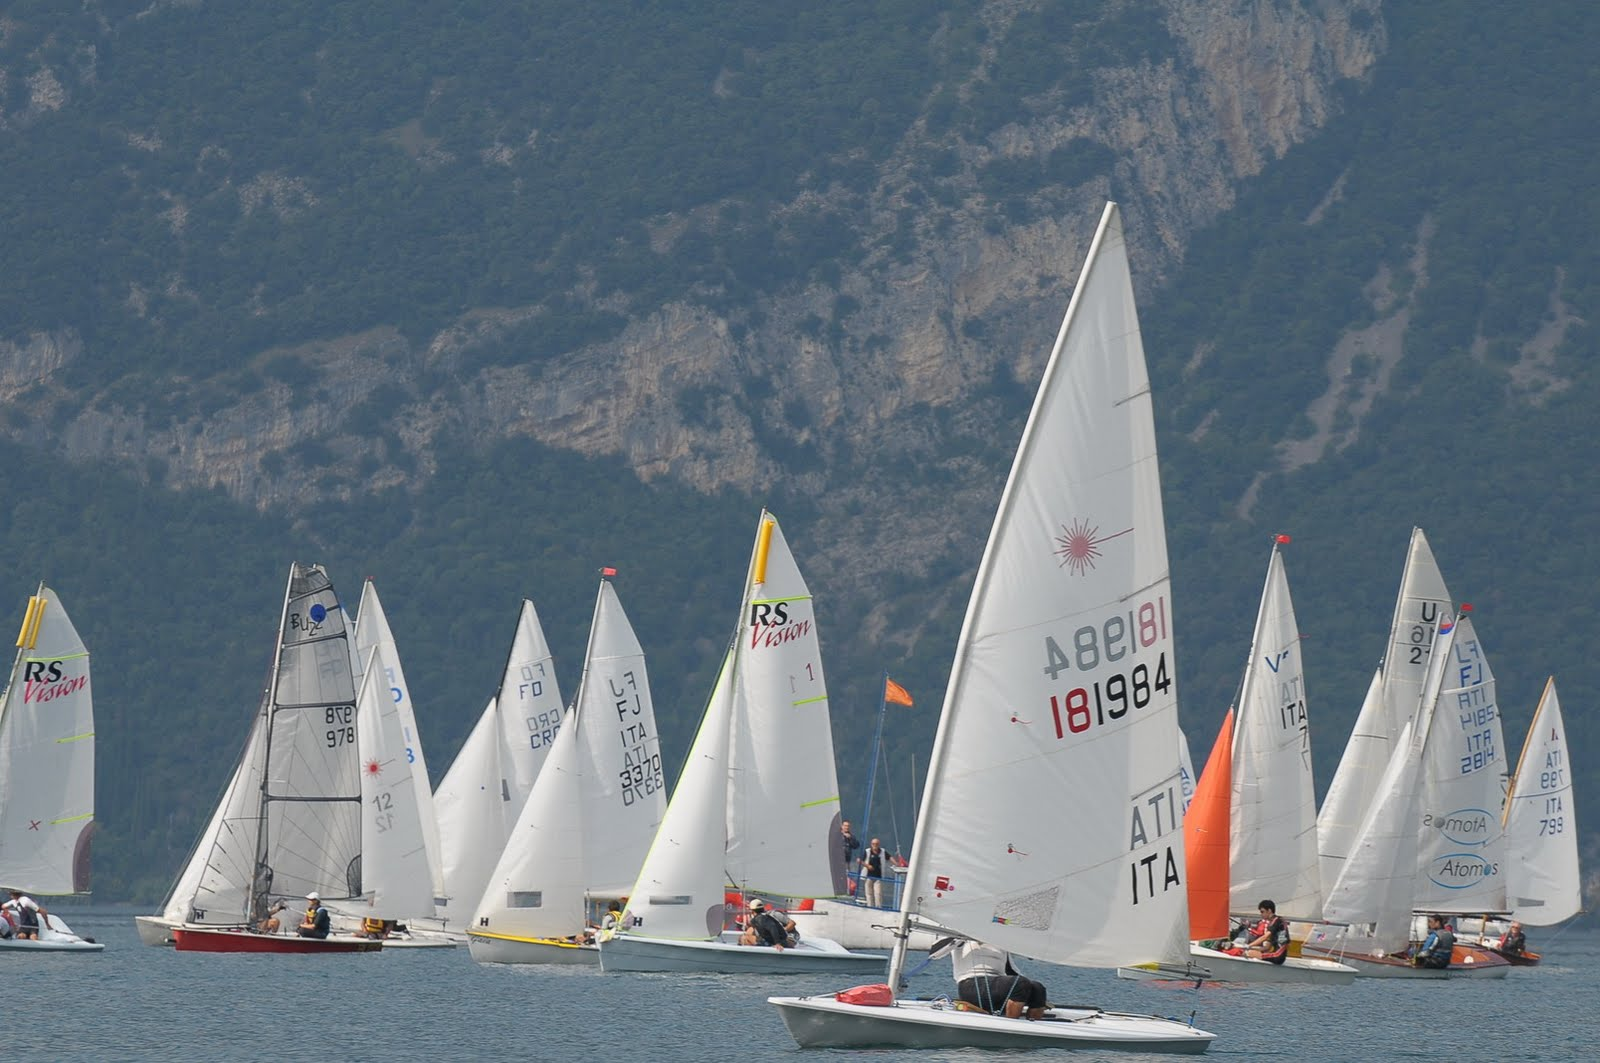 Circuito Modena : Navigamus blog a vela: vela long distance: umberto modena guida la